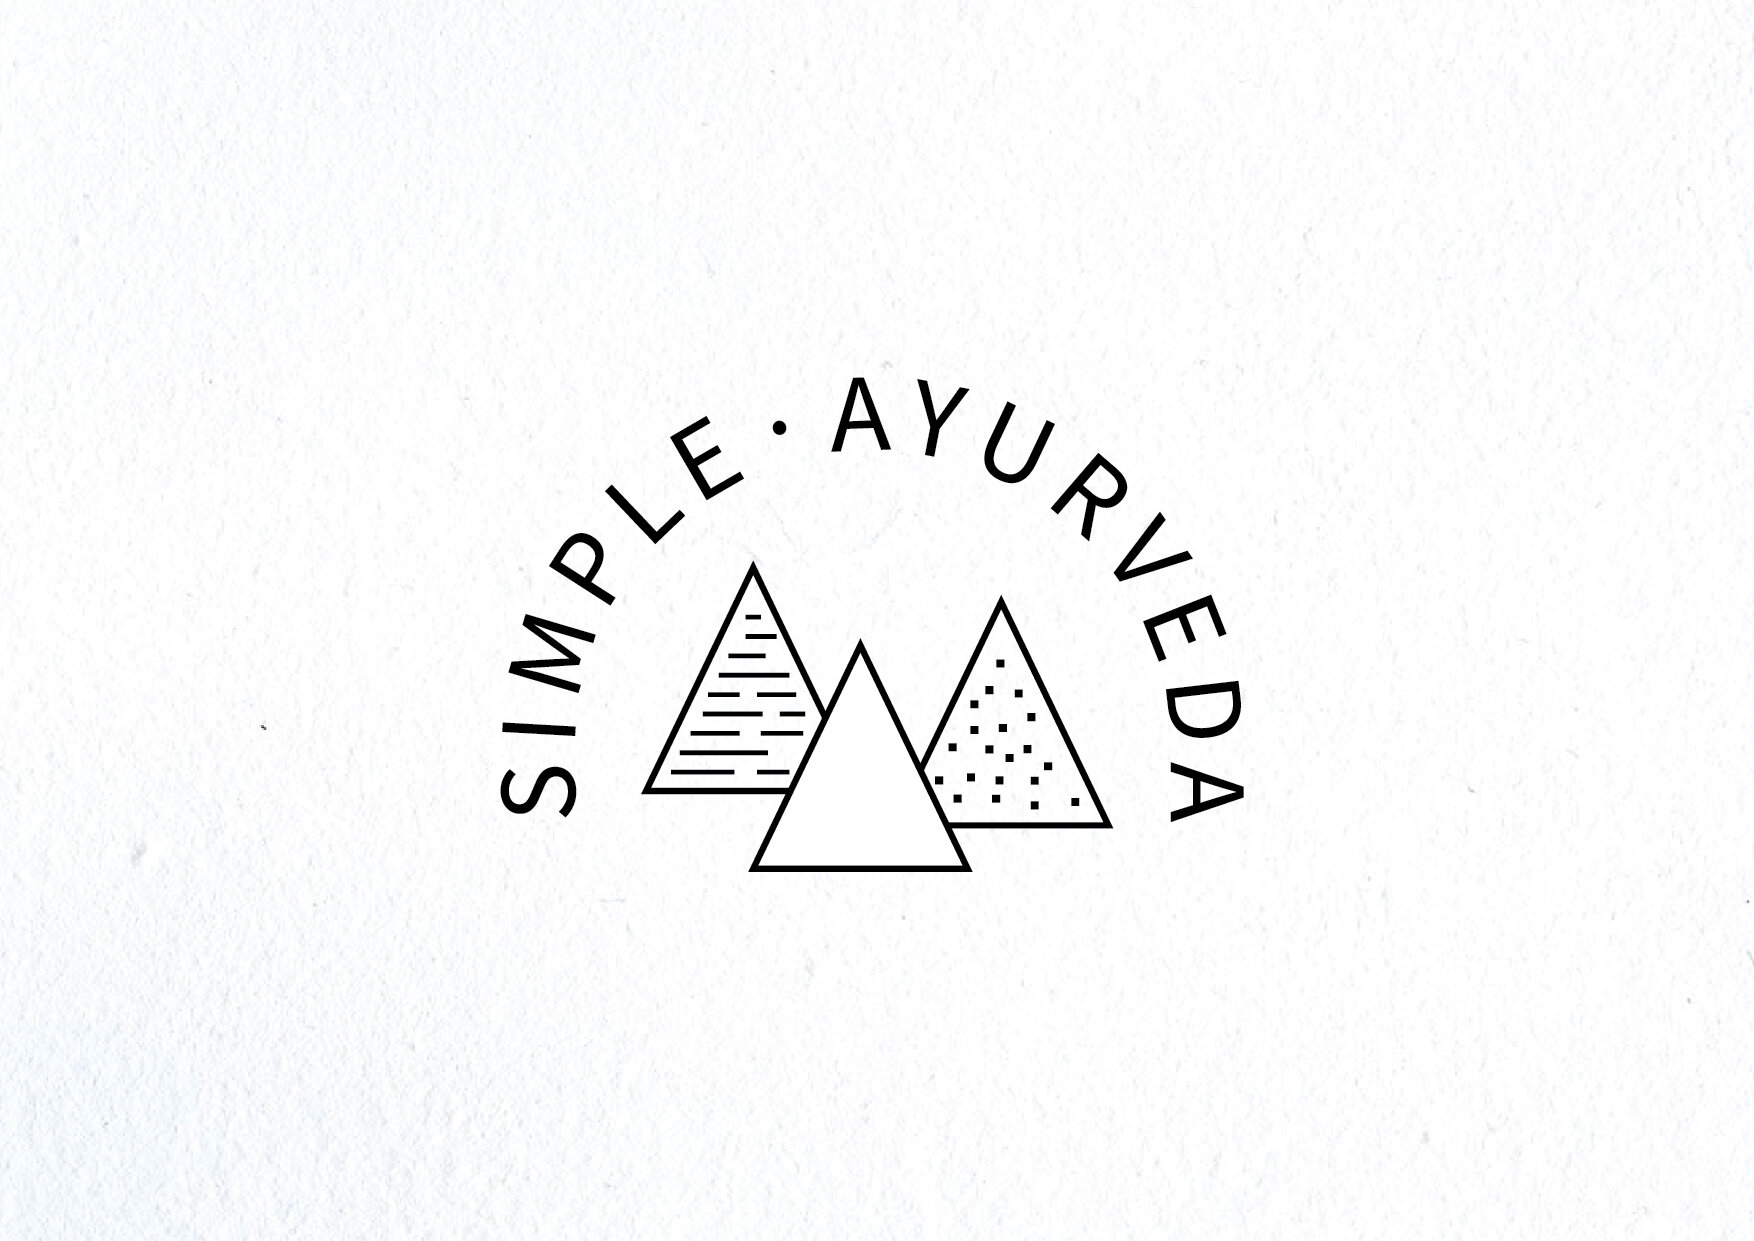 Simply Ayurveda presentation-01.jpg